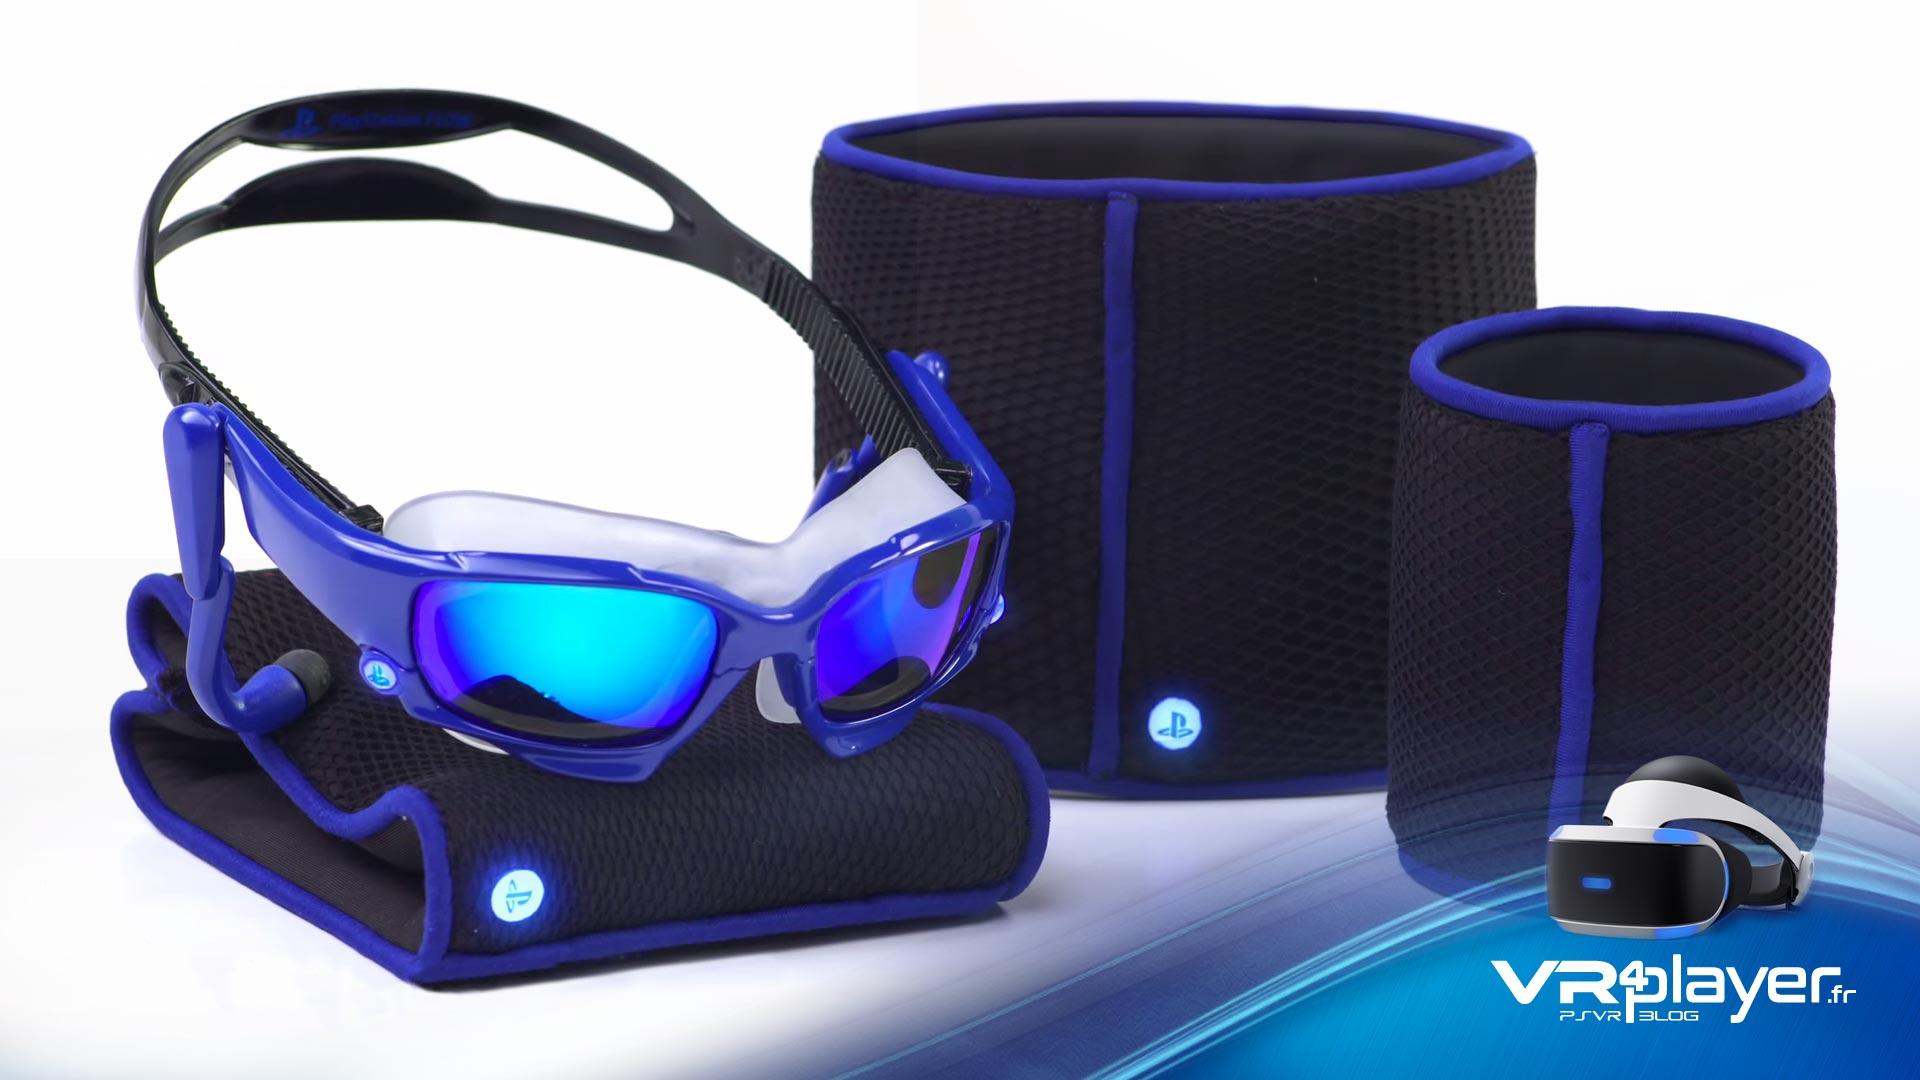 PlayStation Flow PlayStation VR VR4player.fr